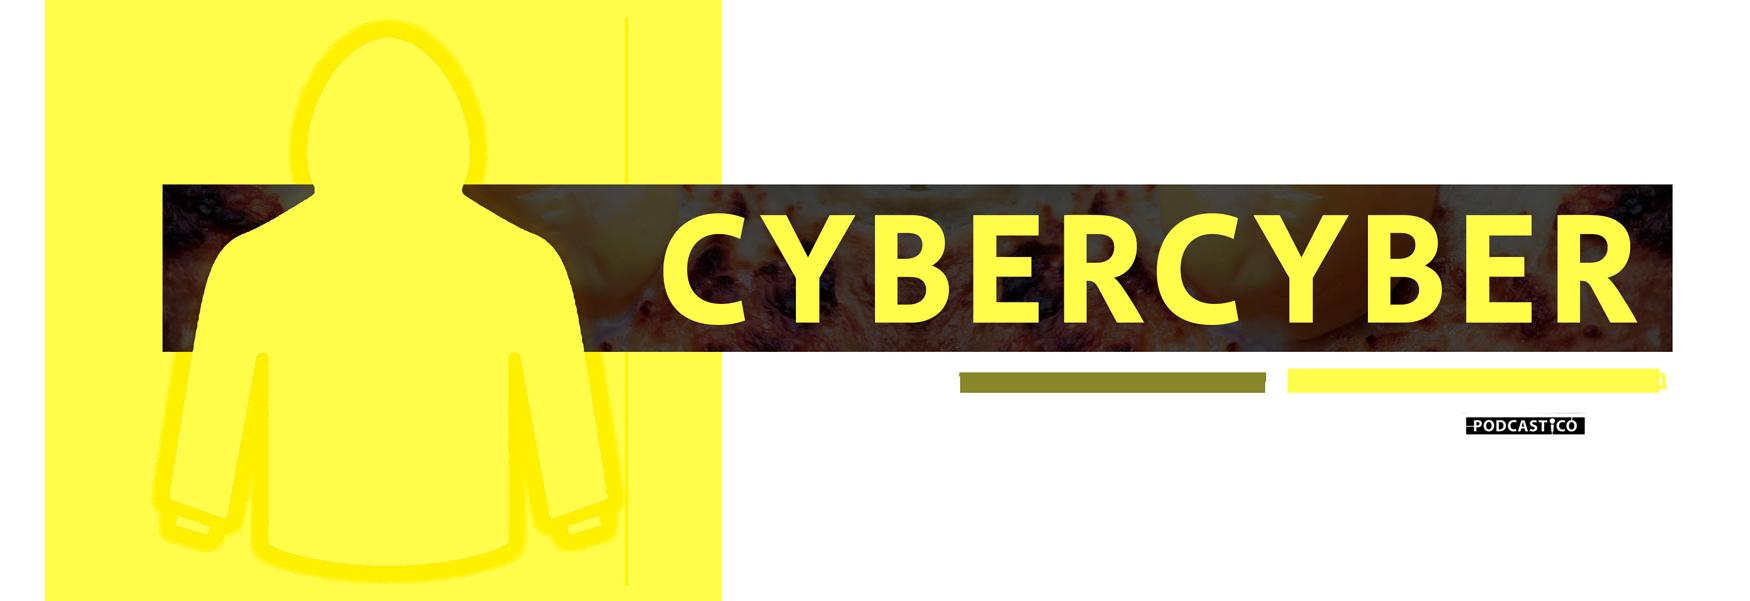 CyberCyber – פודקאסט על האקרים ומאפים